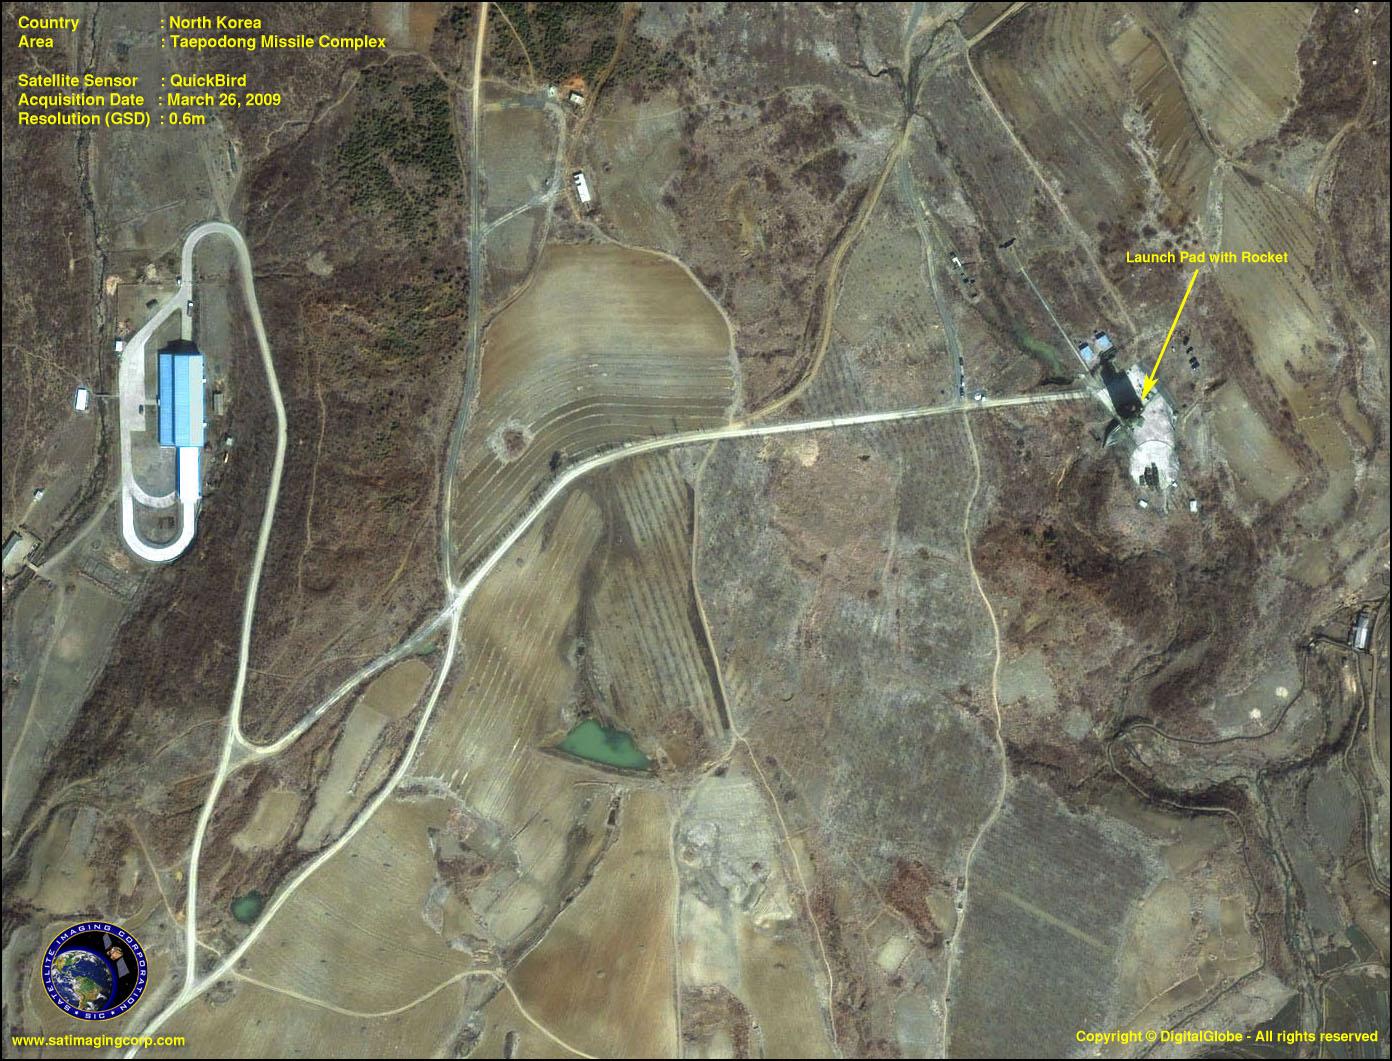 Quickbird Image Taepodong Missile Complex Satellite